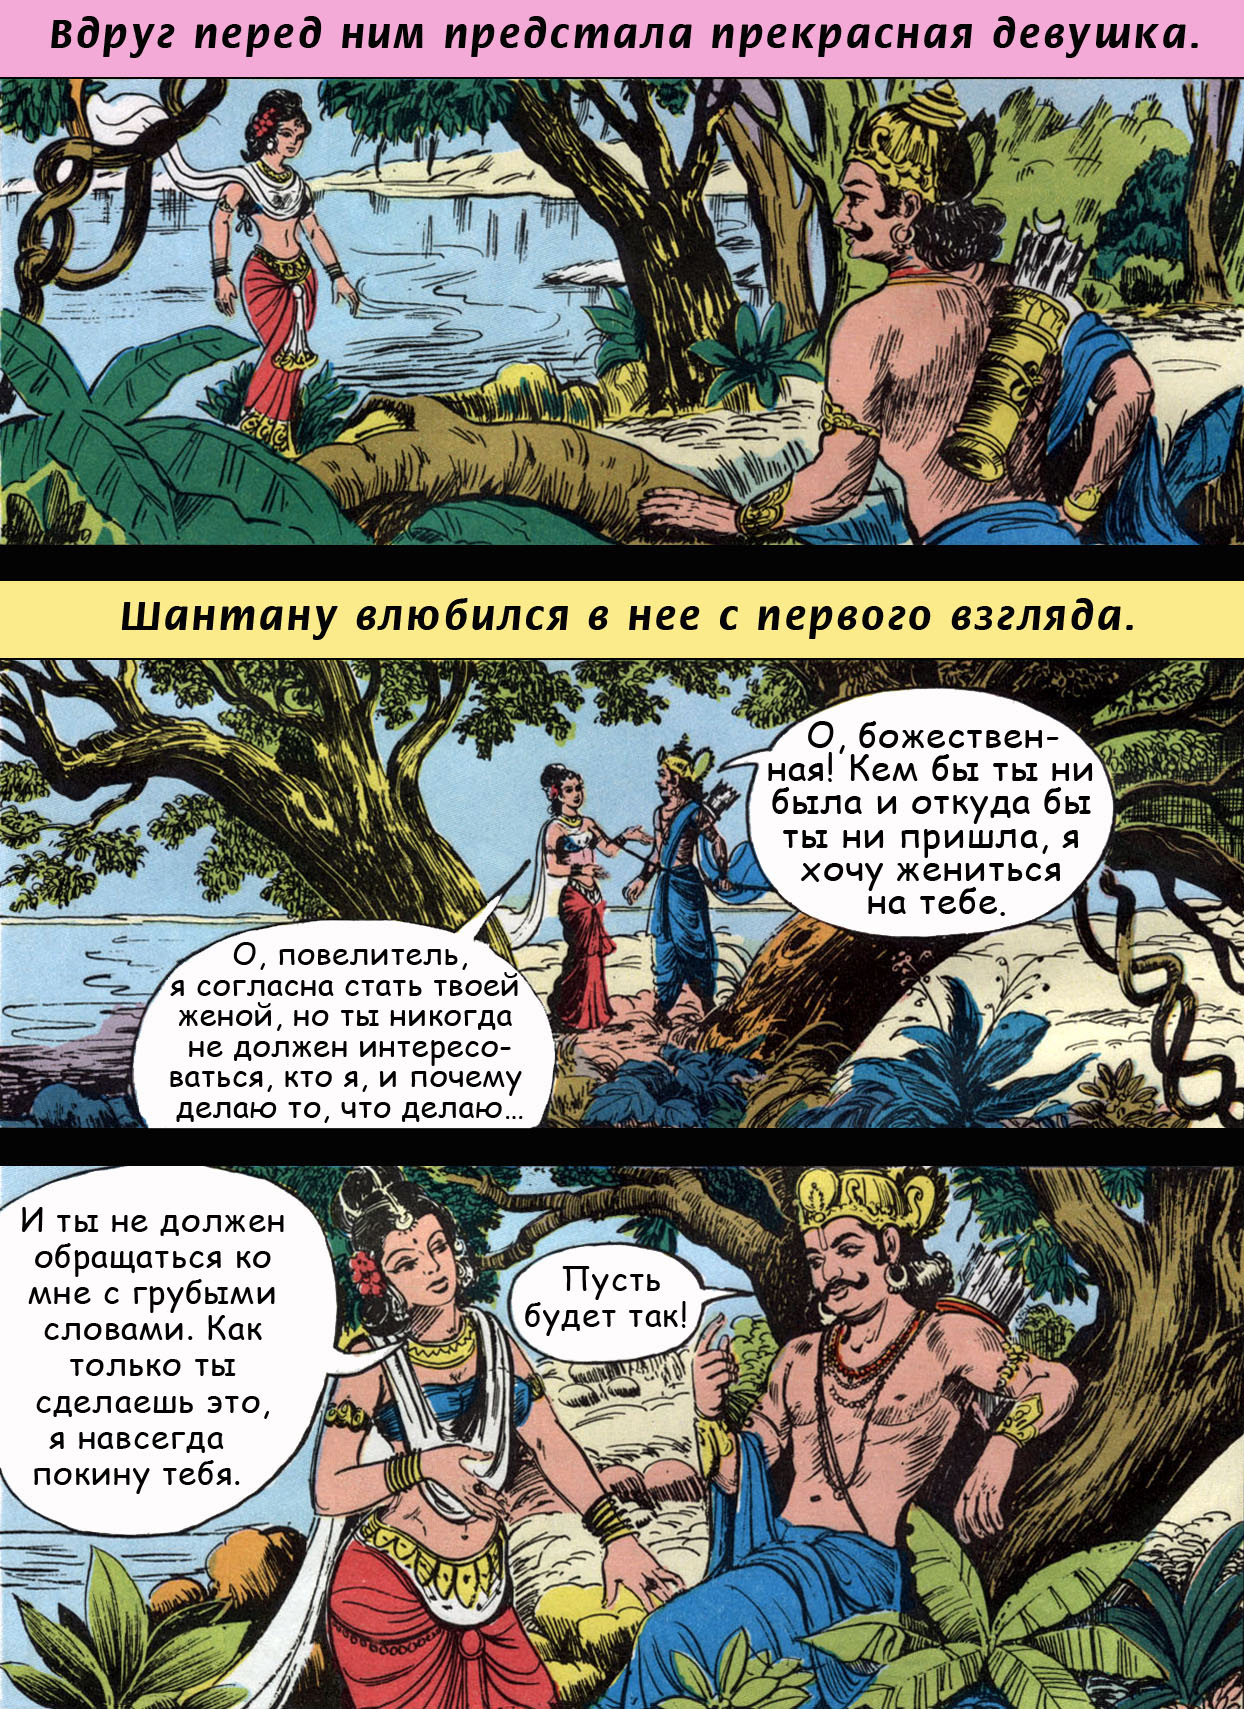 Бхишма 02 - ведический комикс